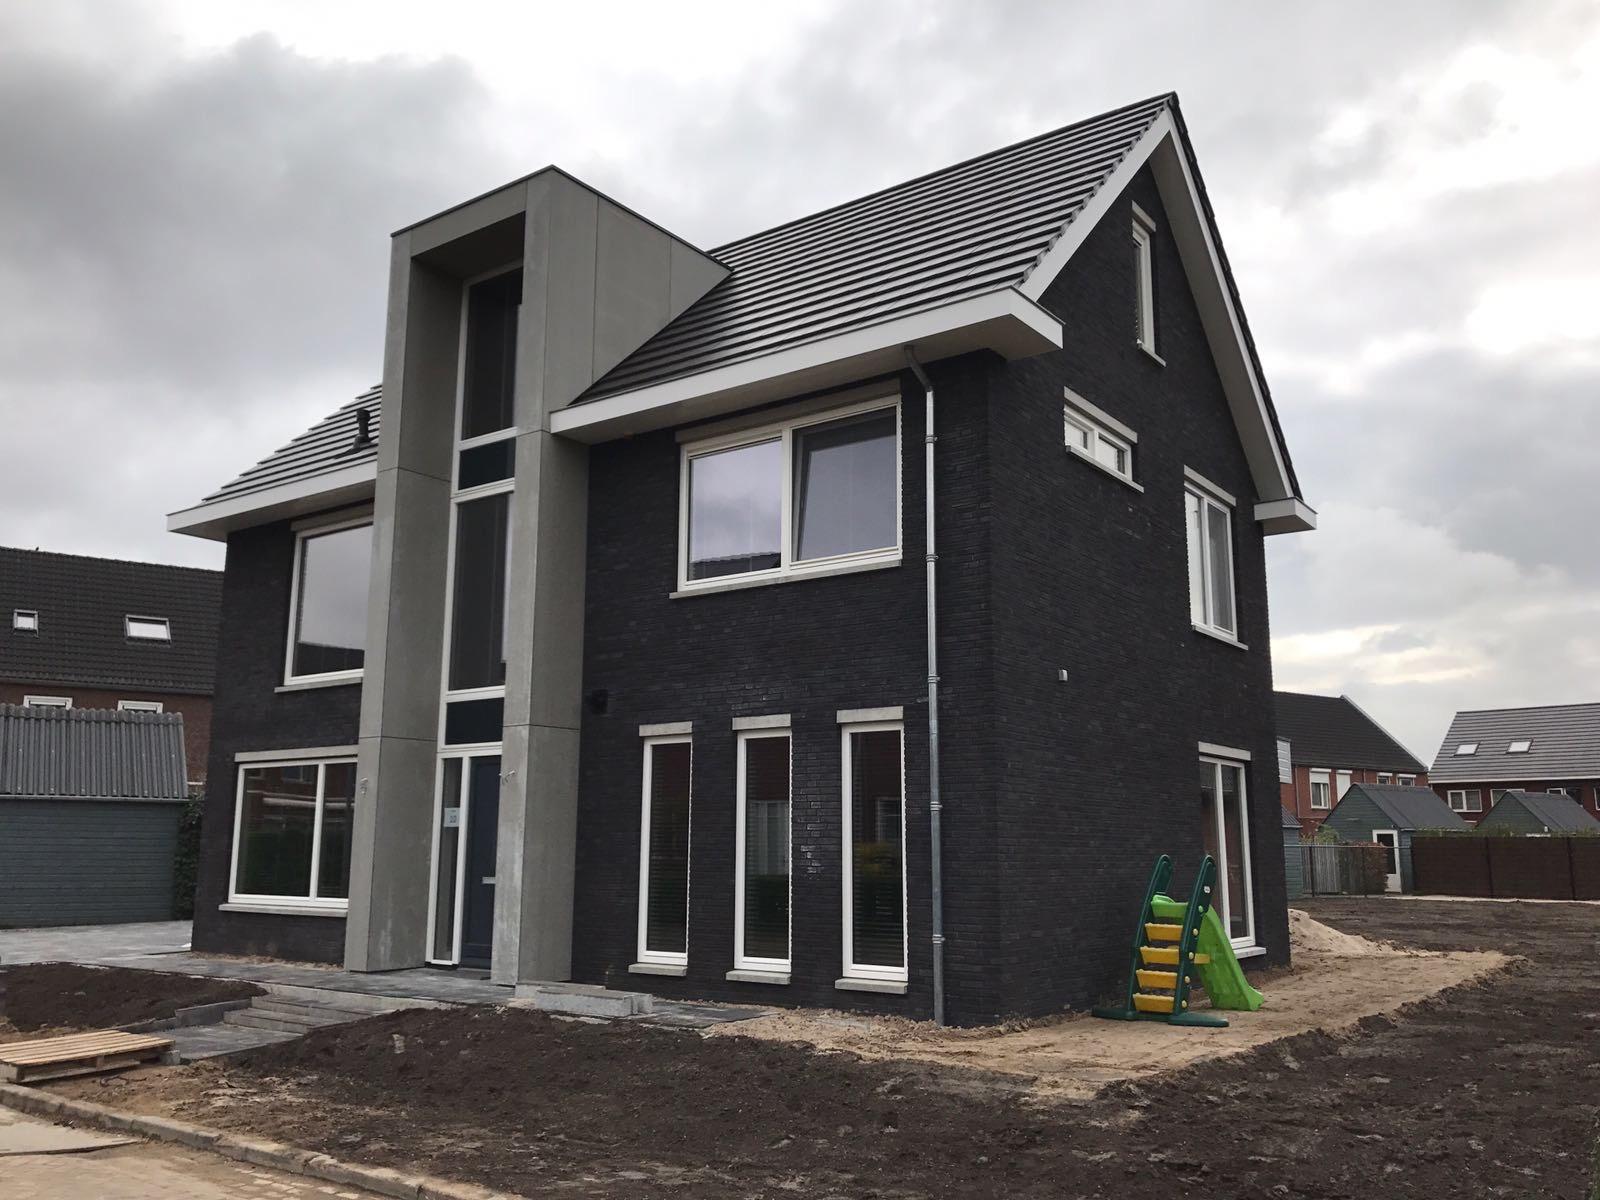 http://uploads.metsander.nl/huis-2-20170727.JPG